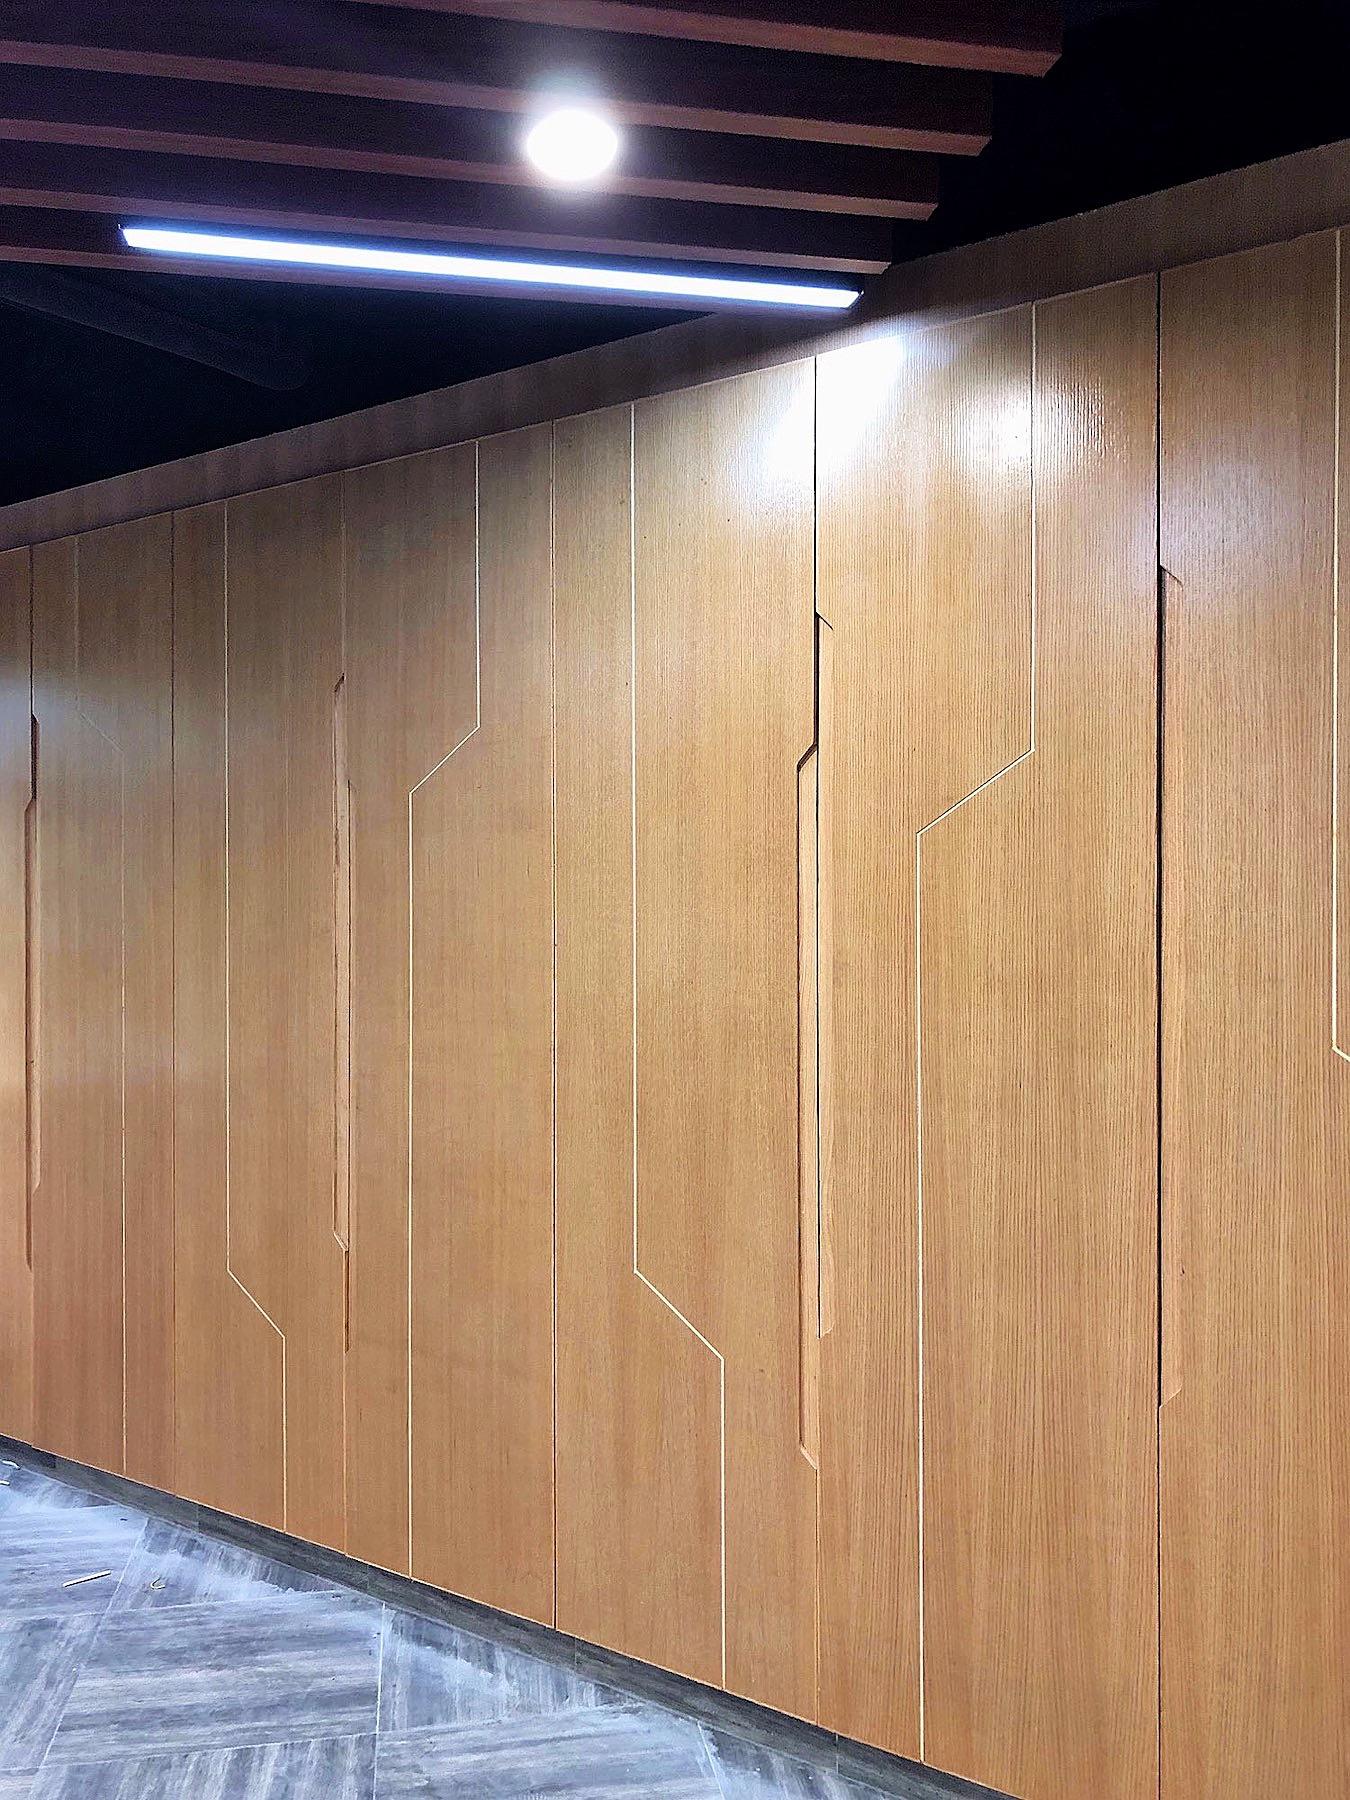 Grandway Office Renovation 2018 Multi Function Room 01 002